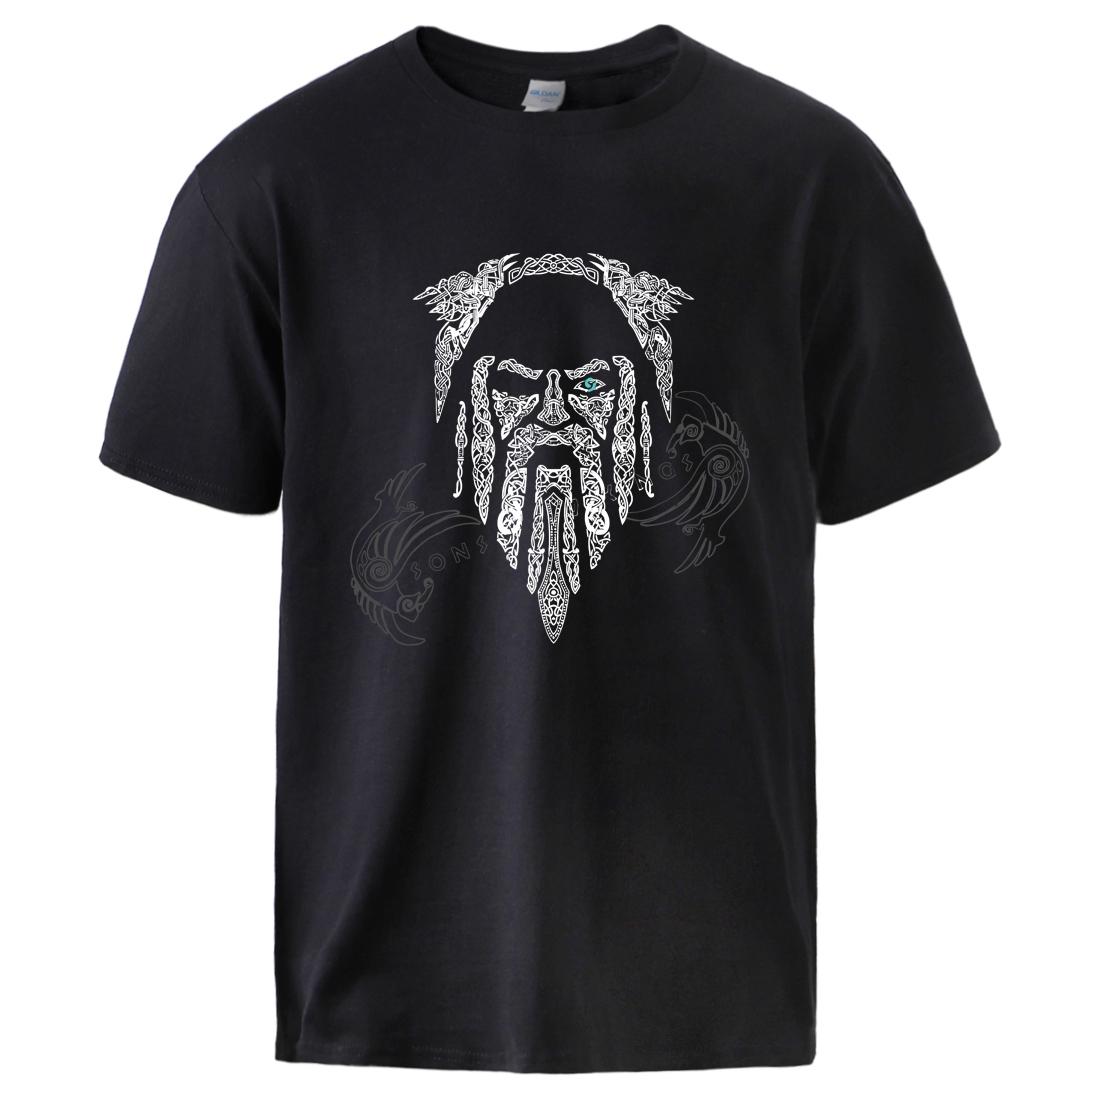 Odin Vikings Son Of Odin Mens Top Tee Summer Short Sleeve Cotton Tshirts 2020 Summer Spring Man Brand Hip Hop Streetwear T shirt